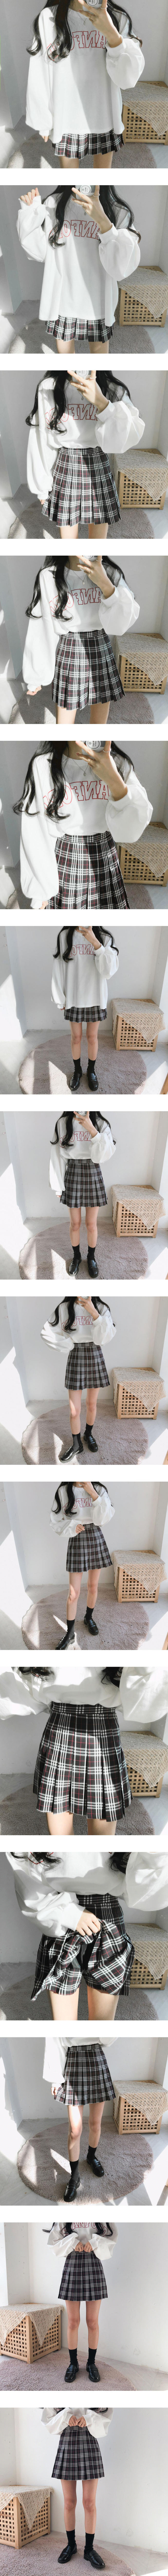 Mini check tennis skirt